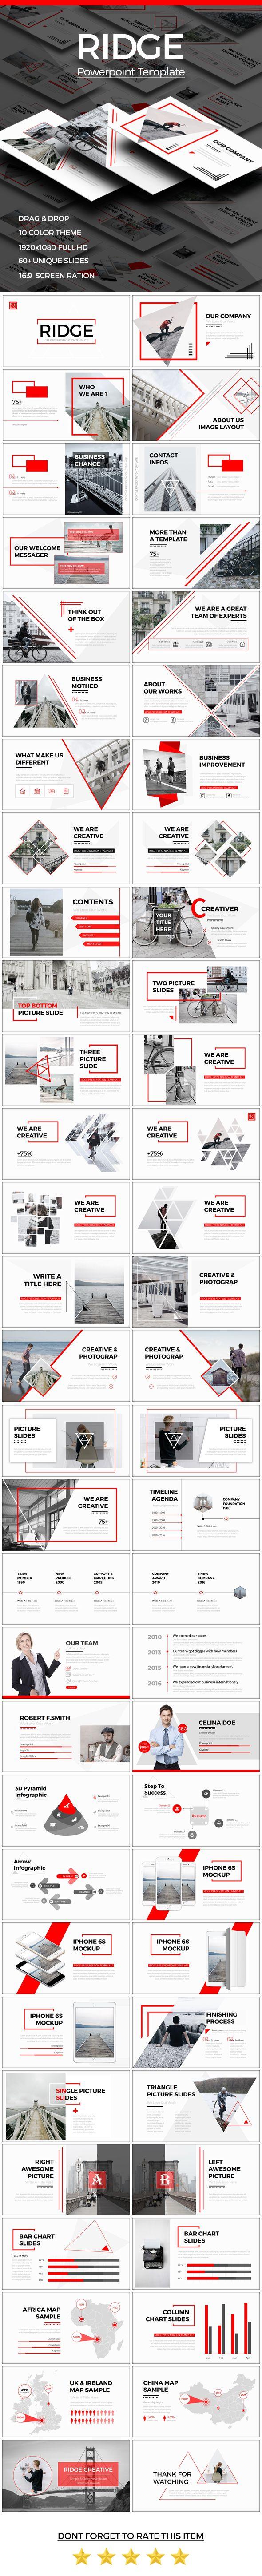 RIDGE CREATIVE Powerpoint Template  #enterprise #excel • Download ➝ https://graphicriver.net/item/ridge-creative-powerpoint-template/18188658?ref=pxcr